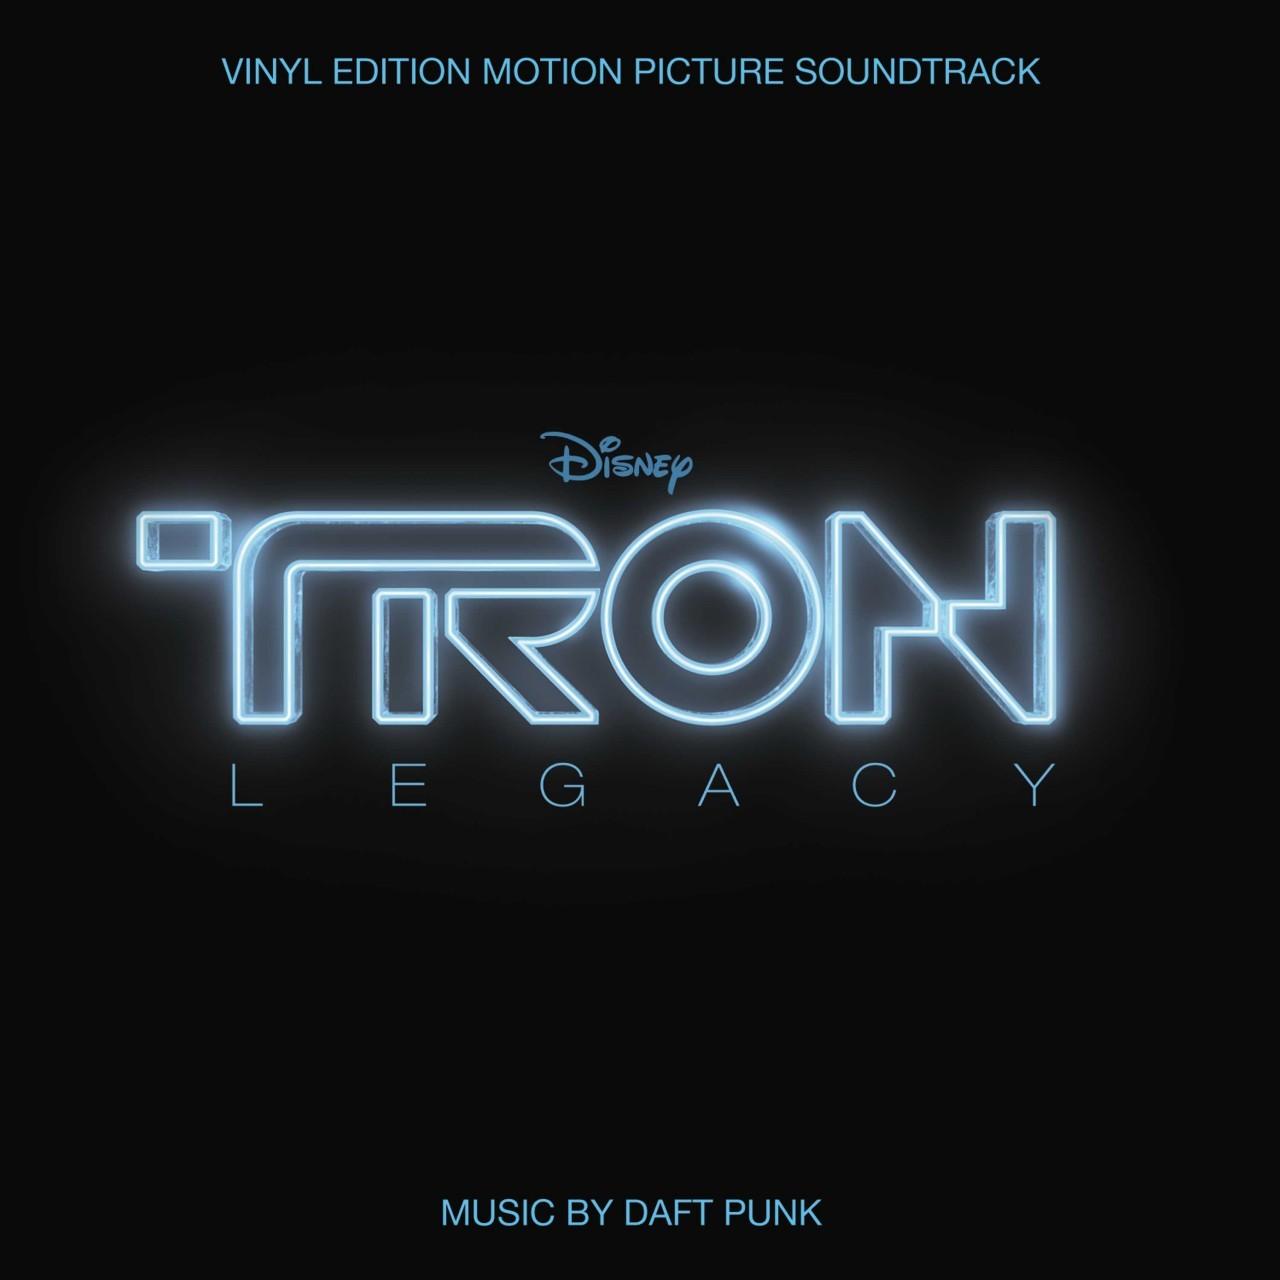 Daft Punk - TRON: Legacy Vinyl Edition 2XLP